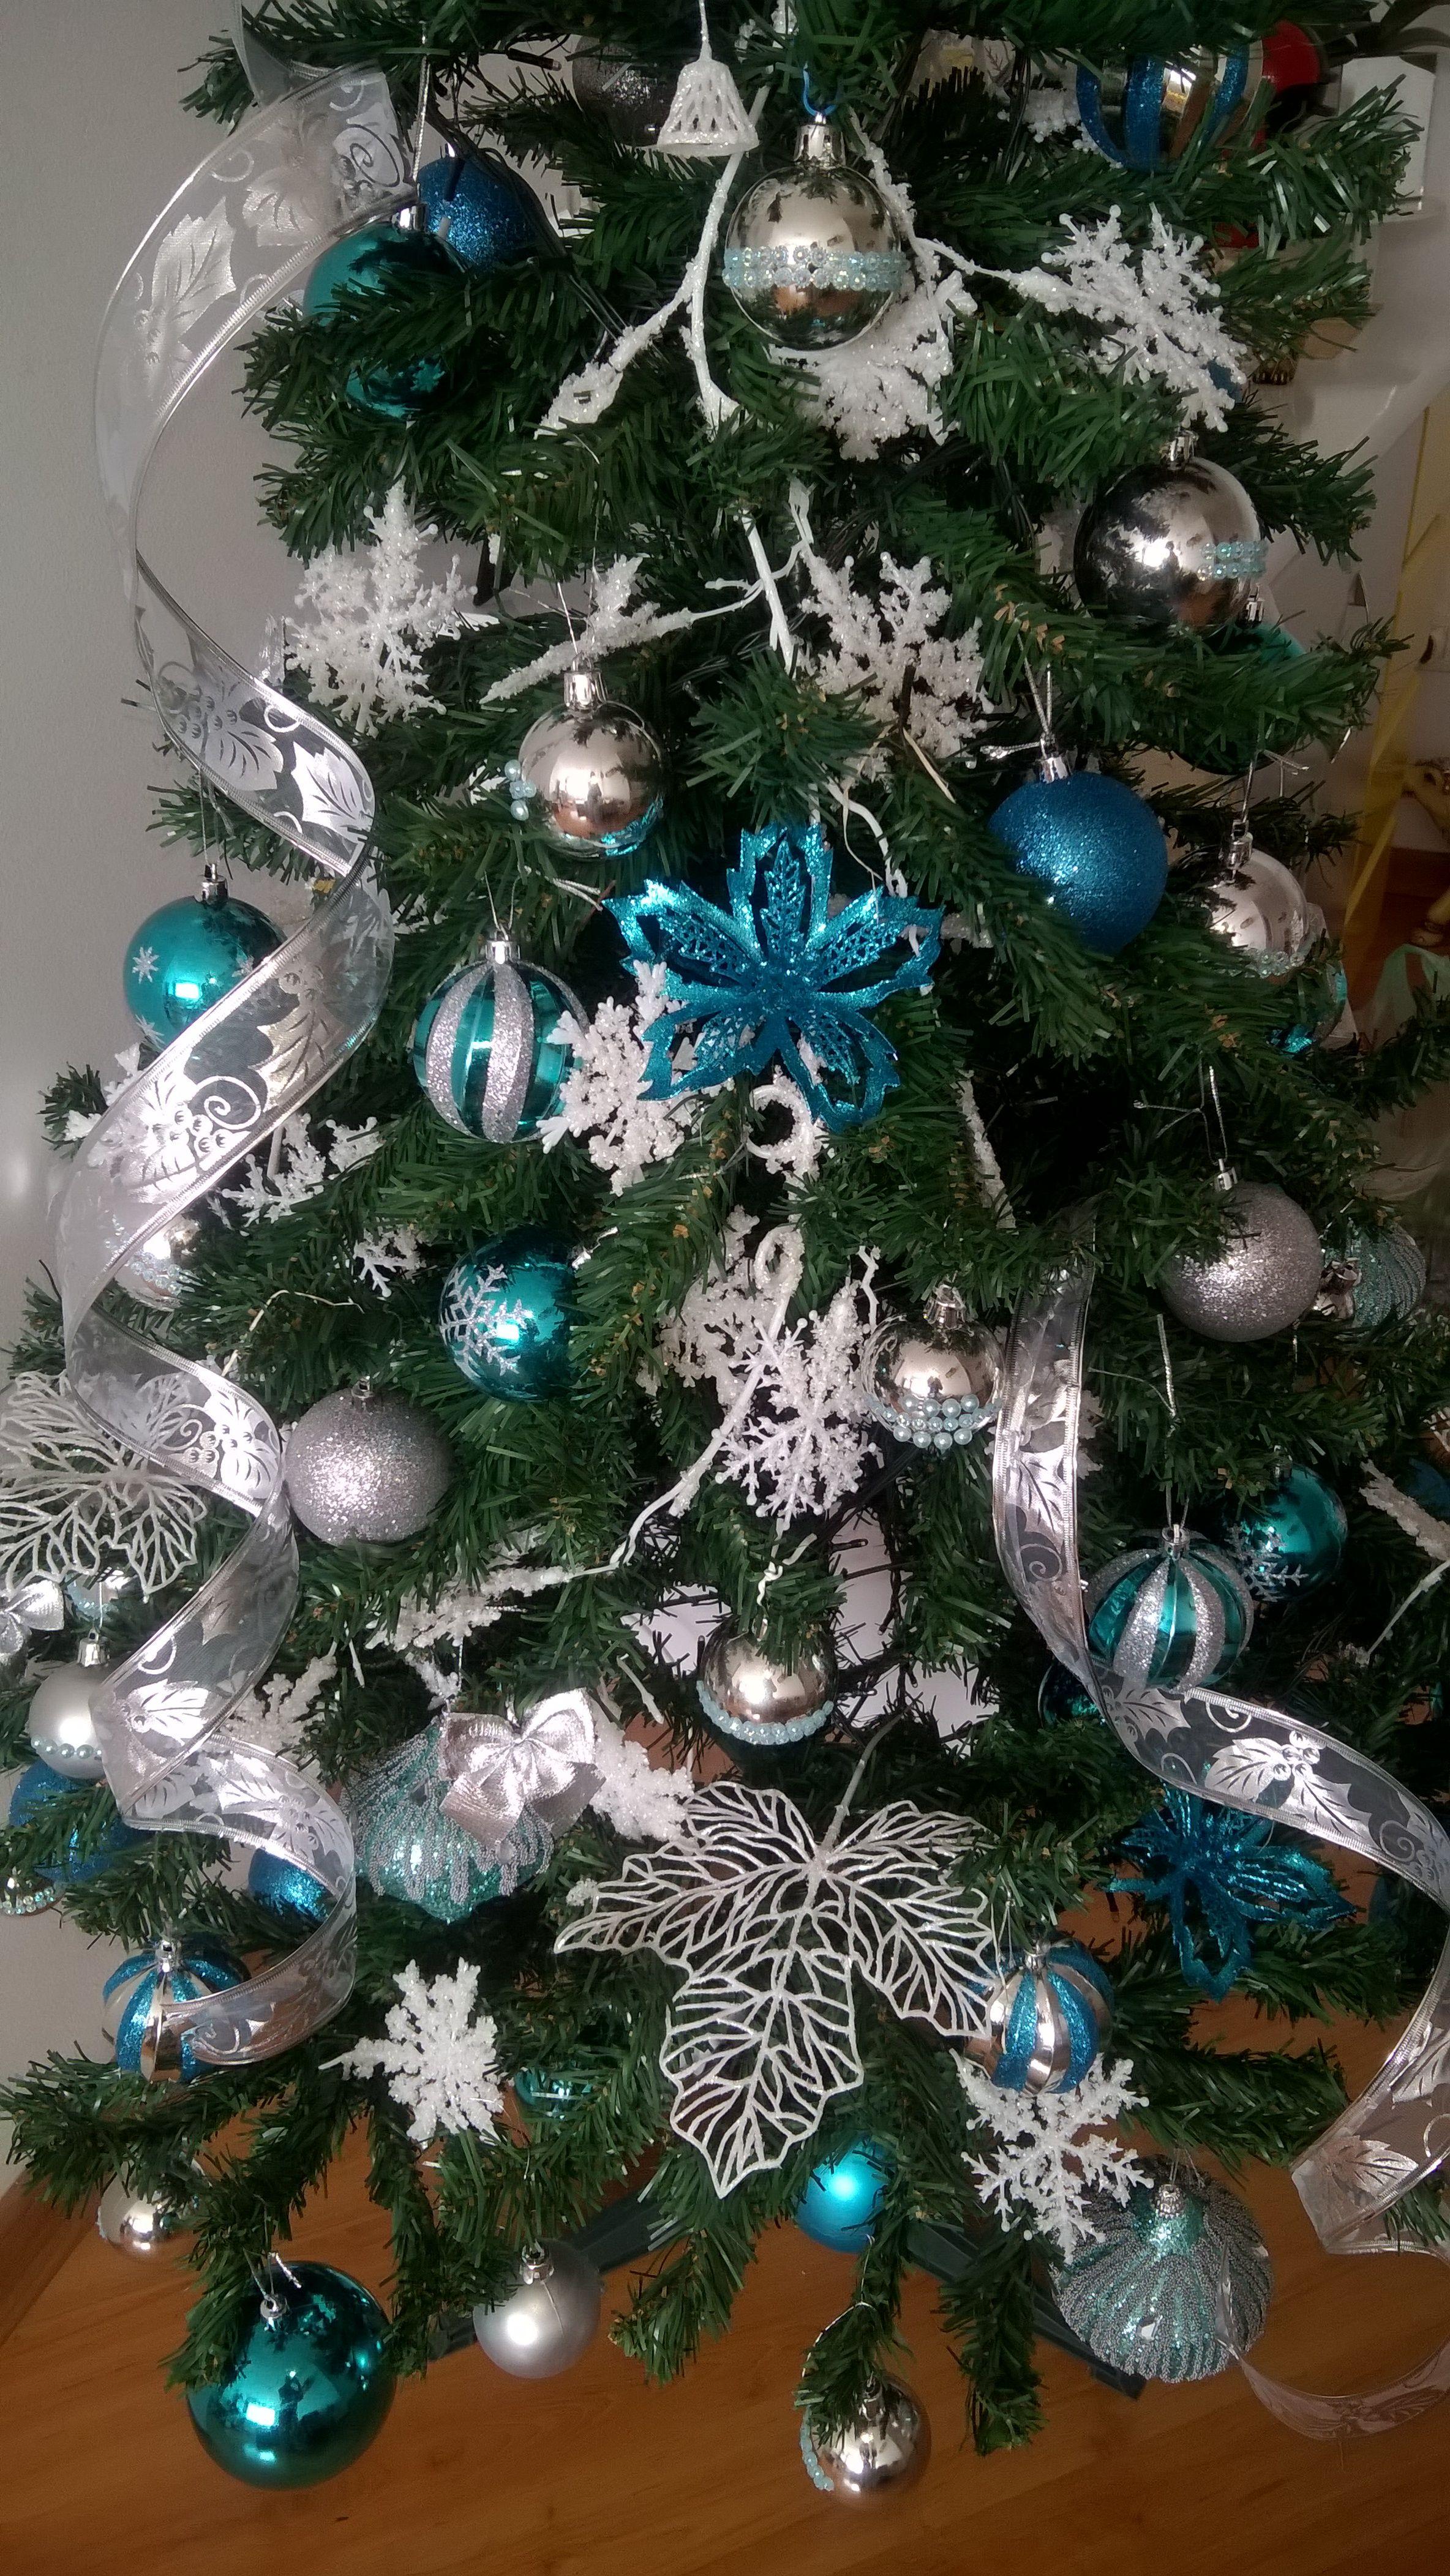 Arvore De Natal Em Tons De Azul Branco E Prata Arvores De